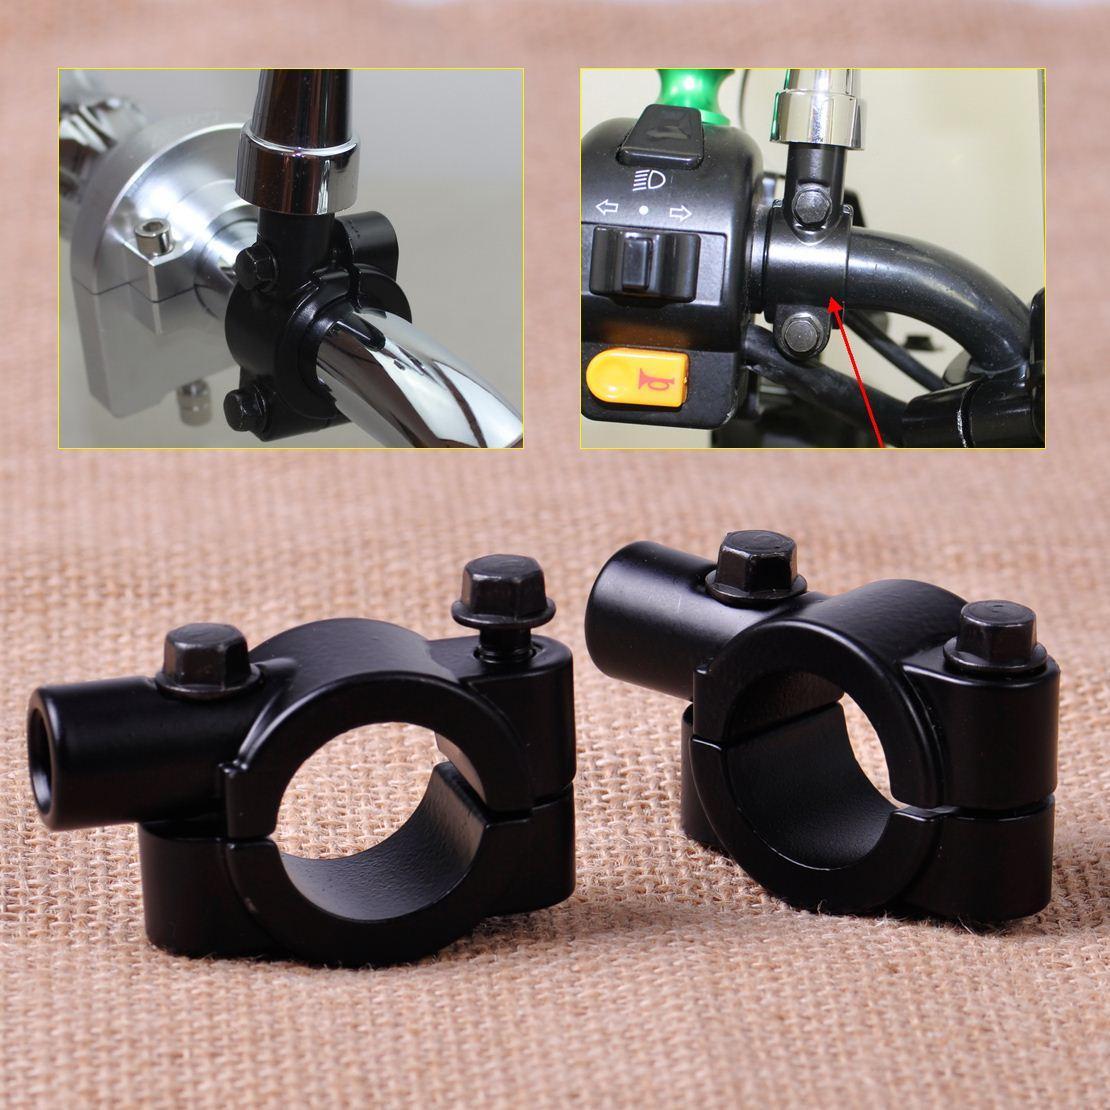 Motorcycle Handlebar Mirror Clamp 1inch 25mm 10mm Mirror Thread Mount Holder Clamp Adaptor Black 2Pieces